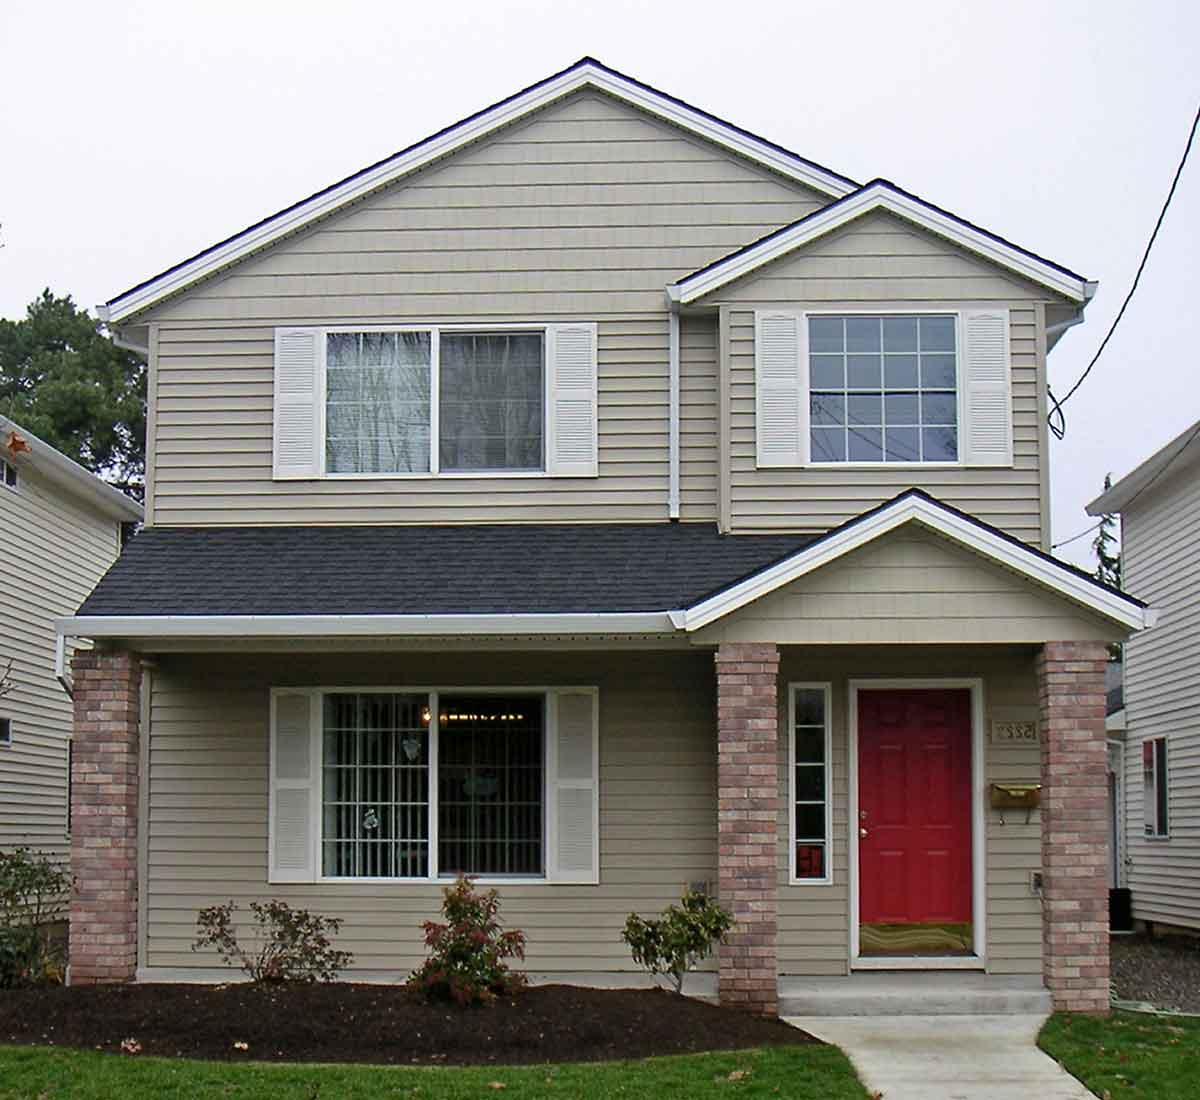 Peachy Narrow Lot House Plans Building Small Houses For Small Lots Inspirational Interior Design Netriciaus